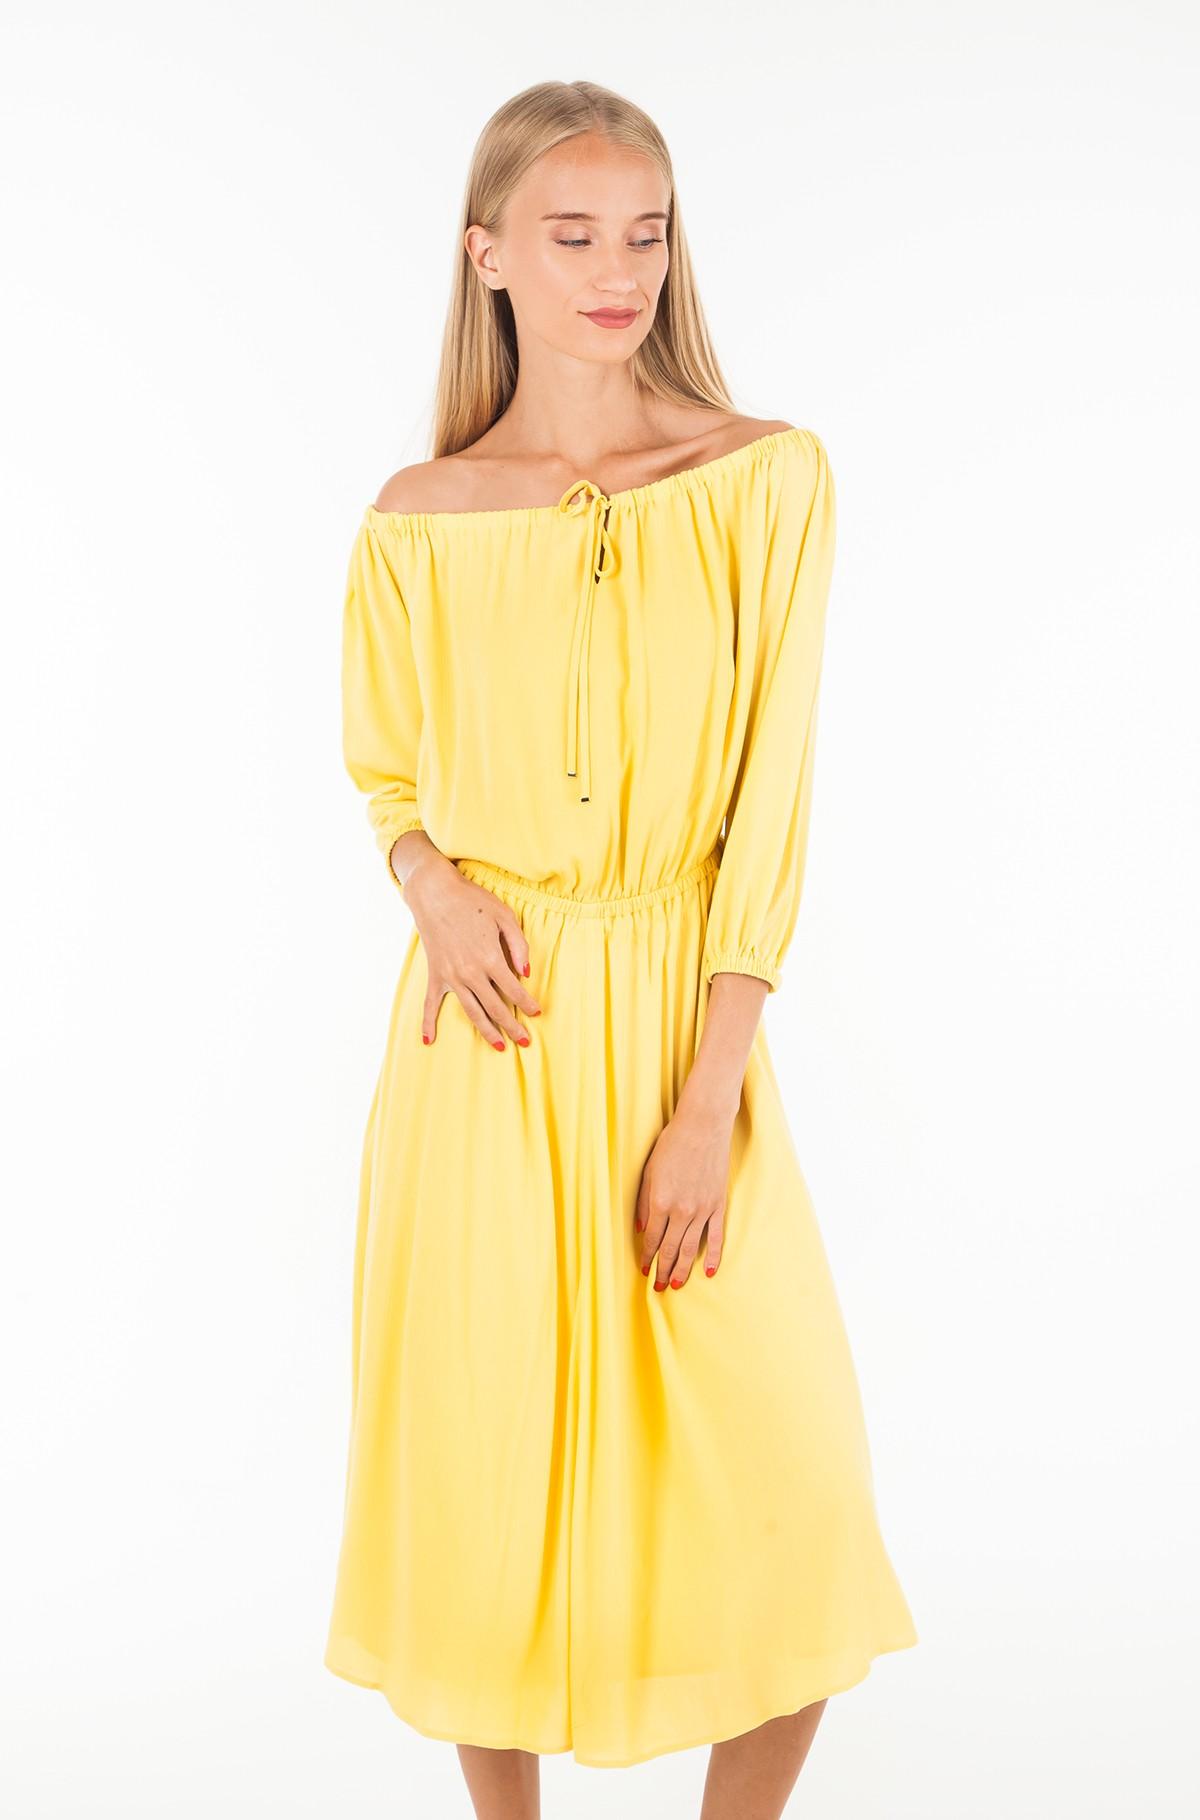 Suknelė RACHEL MIDI DRESS 3/4 SLV-full-1